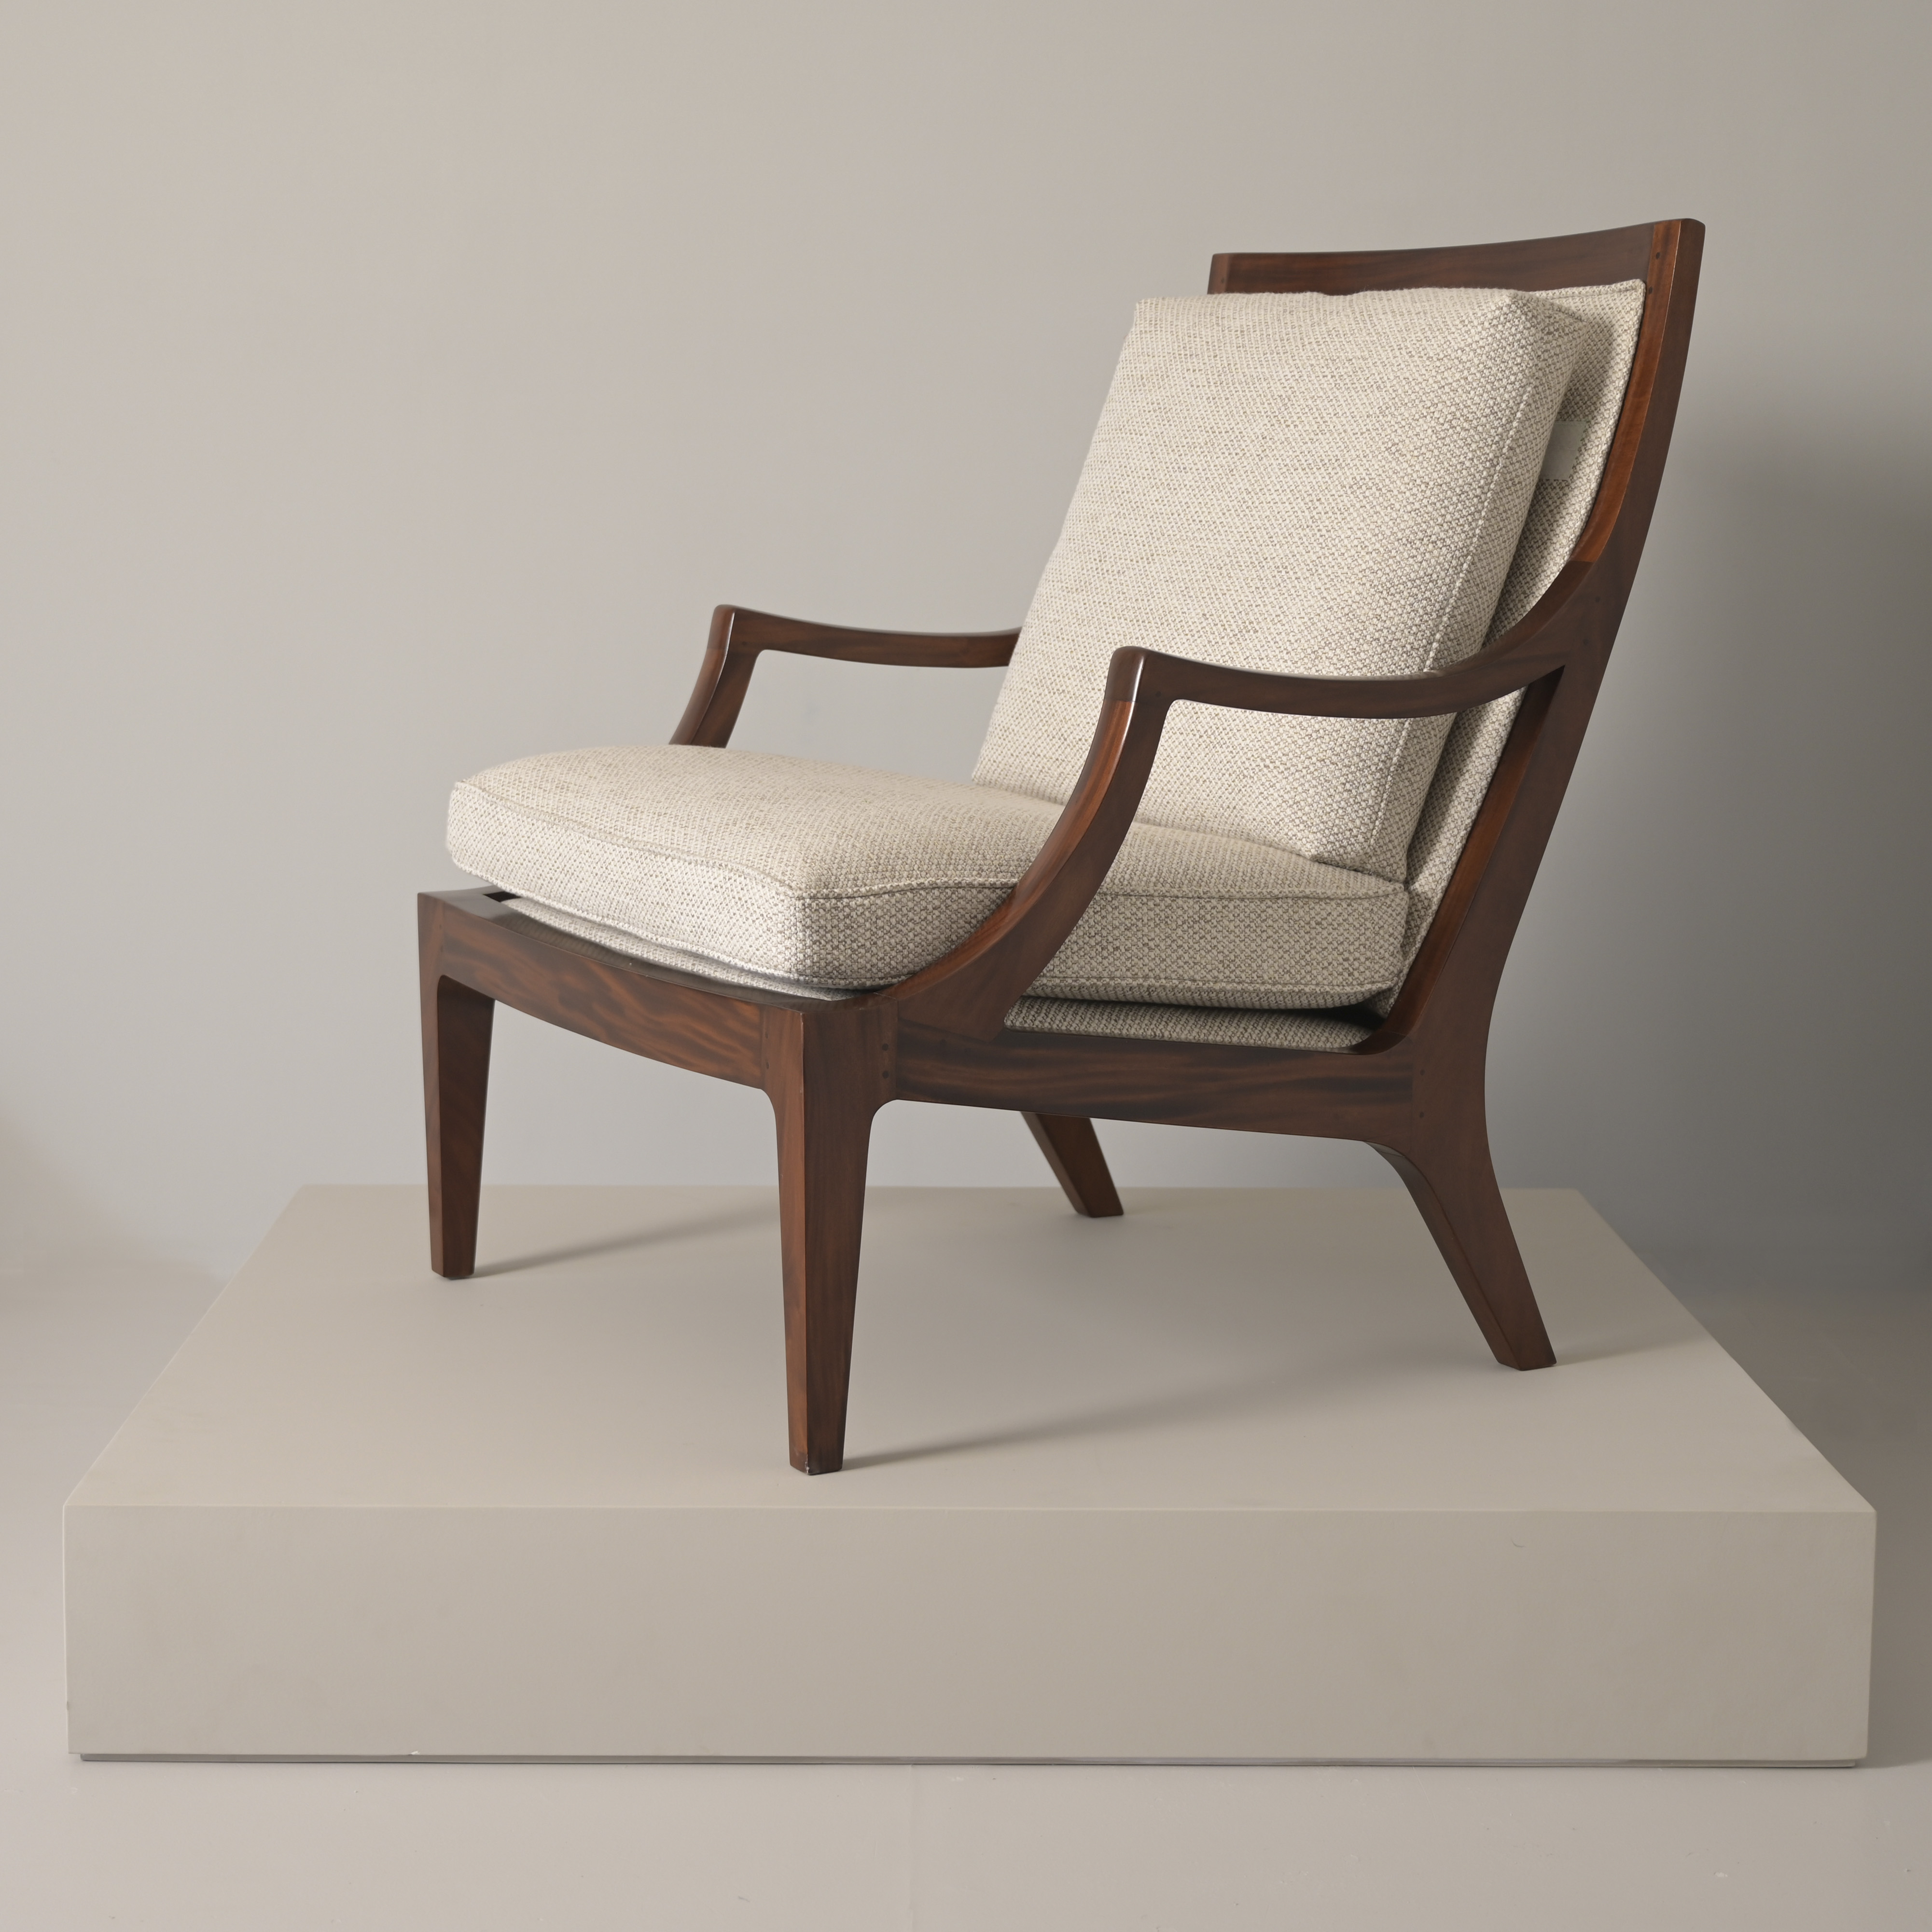 Crescent armchair